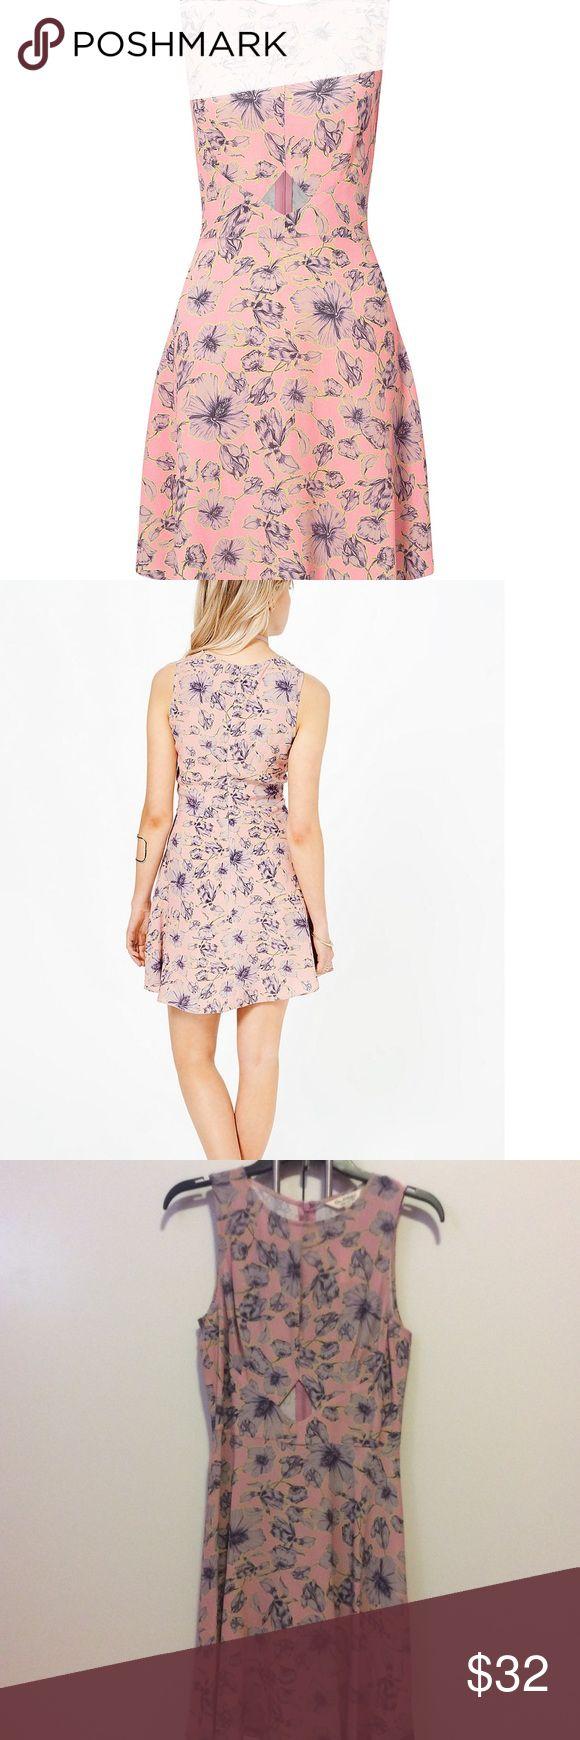 Miss Selfridge Pink Floral dress size 4 Miss Selfridge pink vintage style Floral dress. Cutout slightly above waist for peekaboo detail. NWT, never worn. Size US 4 UK 8. Zippered back. Miss Selfridge Dresses